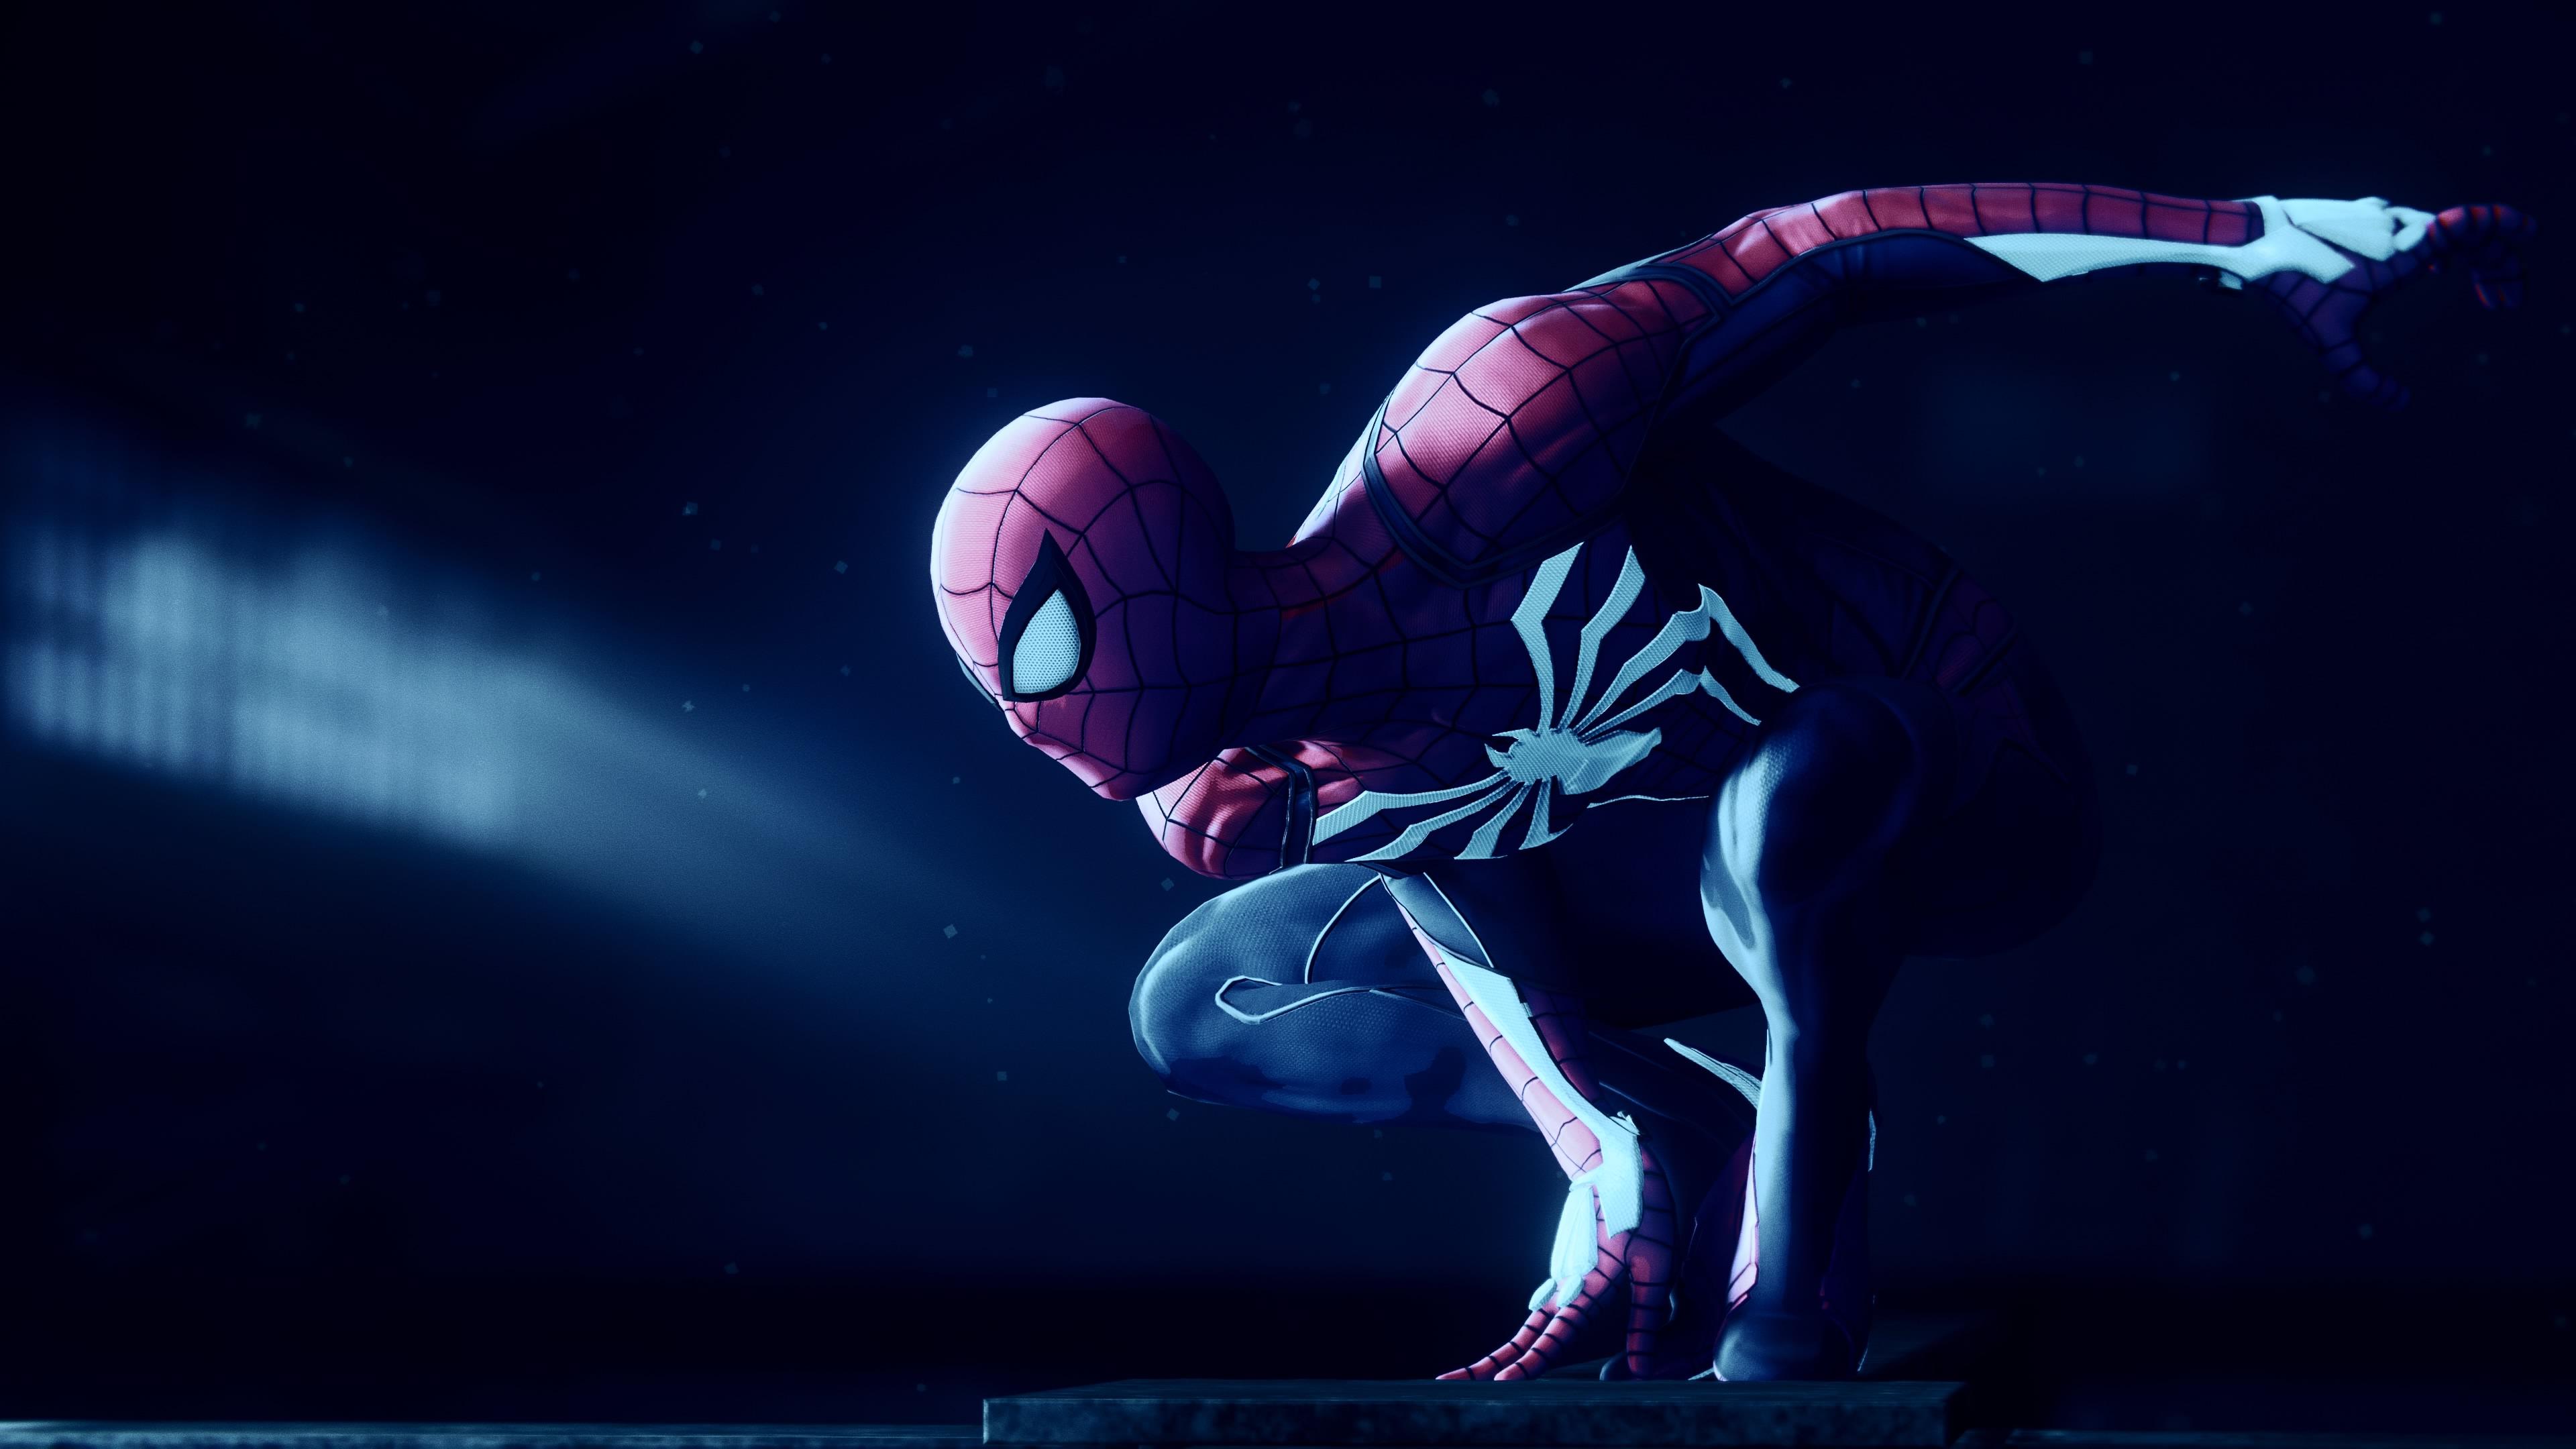 Marvel Spiderman Game 4k Hd Games 4k Wallpapers Images